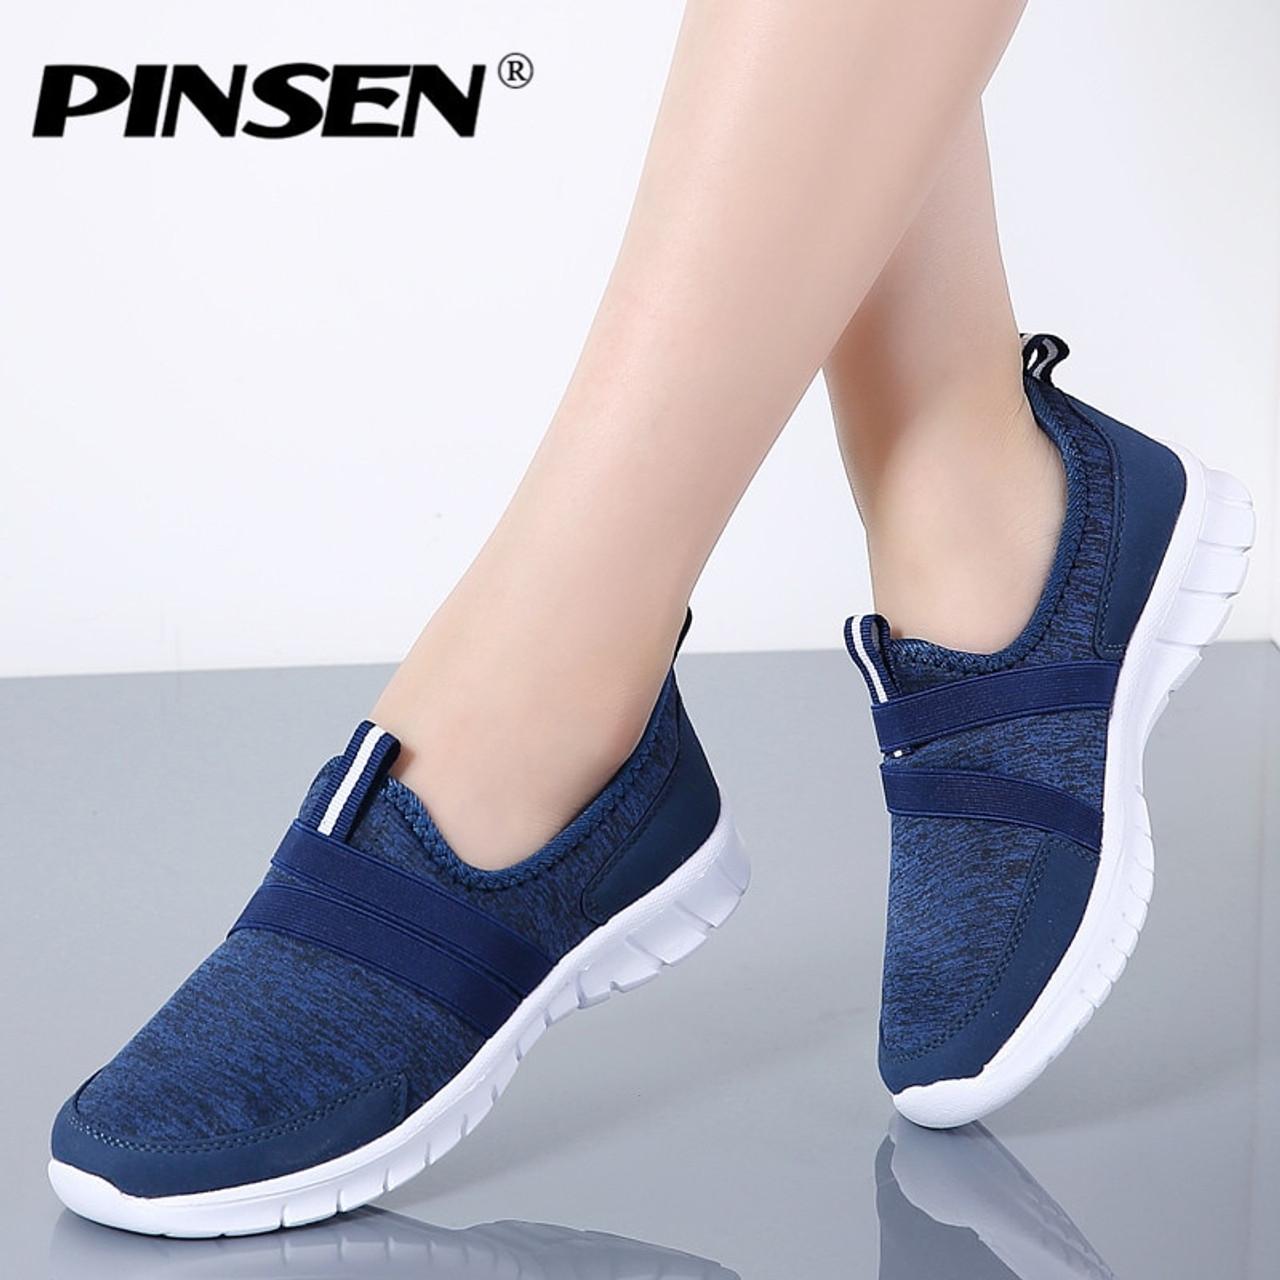 0e62c2295ce7 PINSEN 2019 Autumn Sneakers Women Breathable Mesh Shoes Woman Ballet Slip  On Flats Loafers Ladies Shoes ...